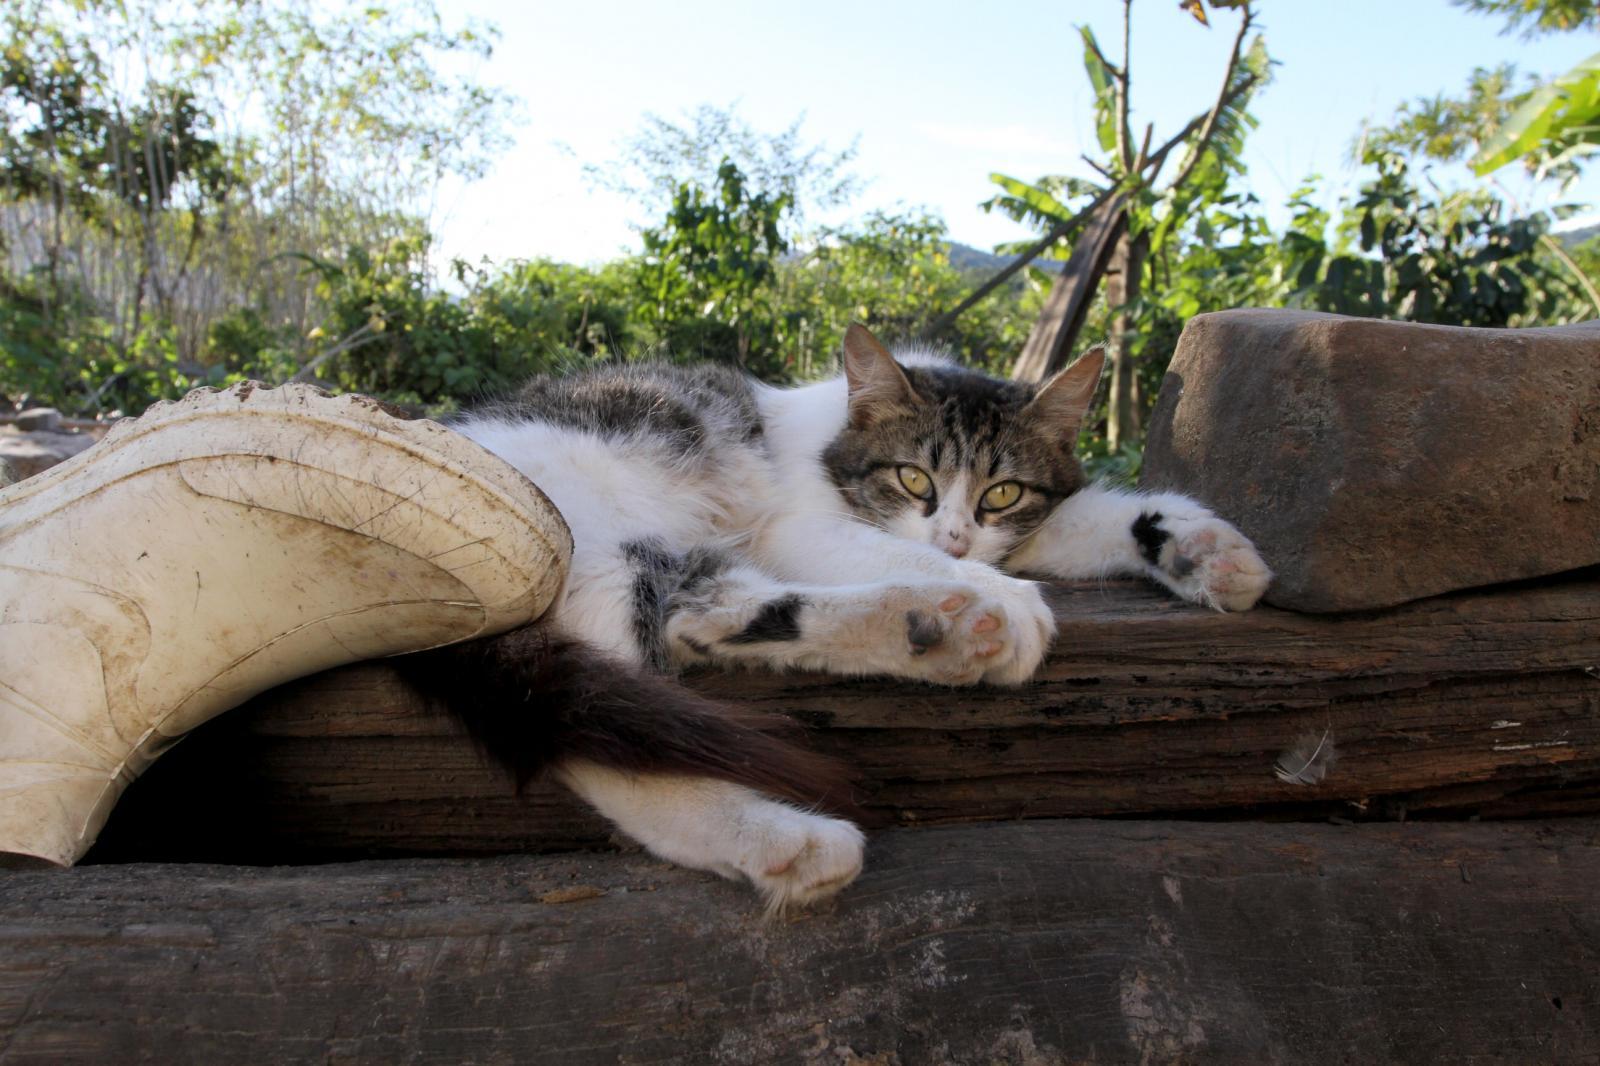 The village cat sleeps as the Pataxós HãHãHãe's pray.